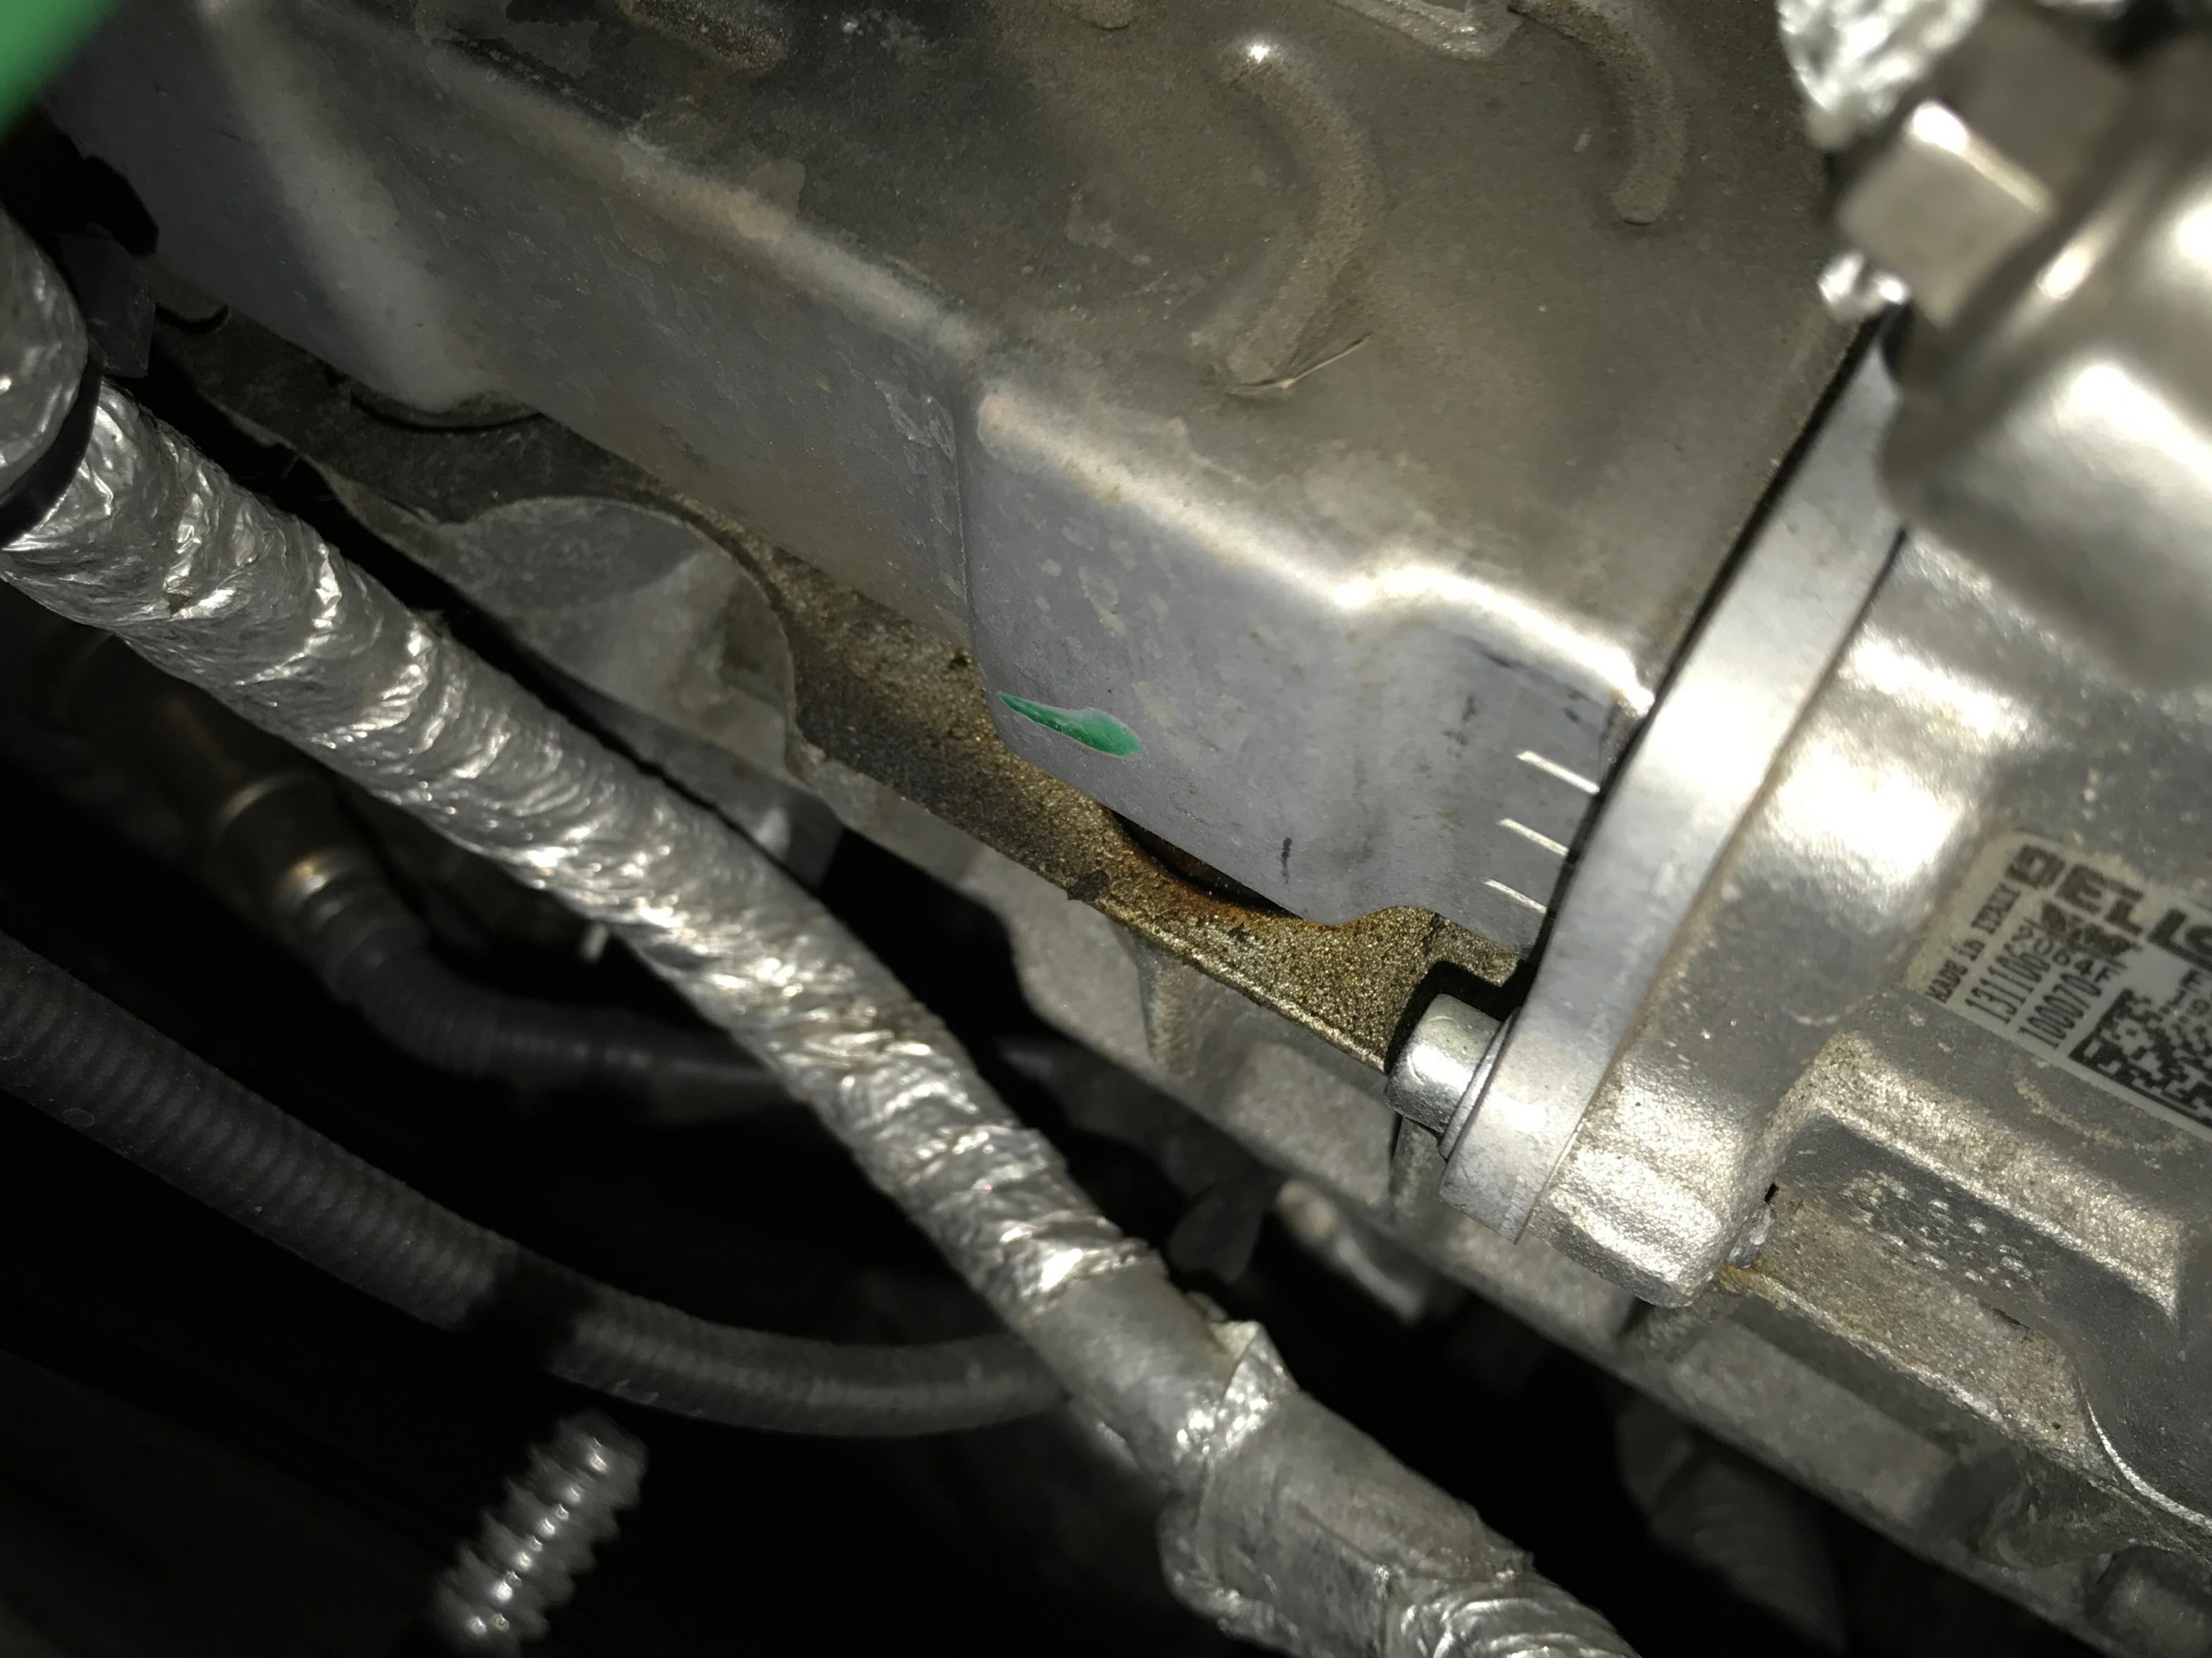 Egr Leak Coolant Sludge A Code And Pictures Jeep Garage